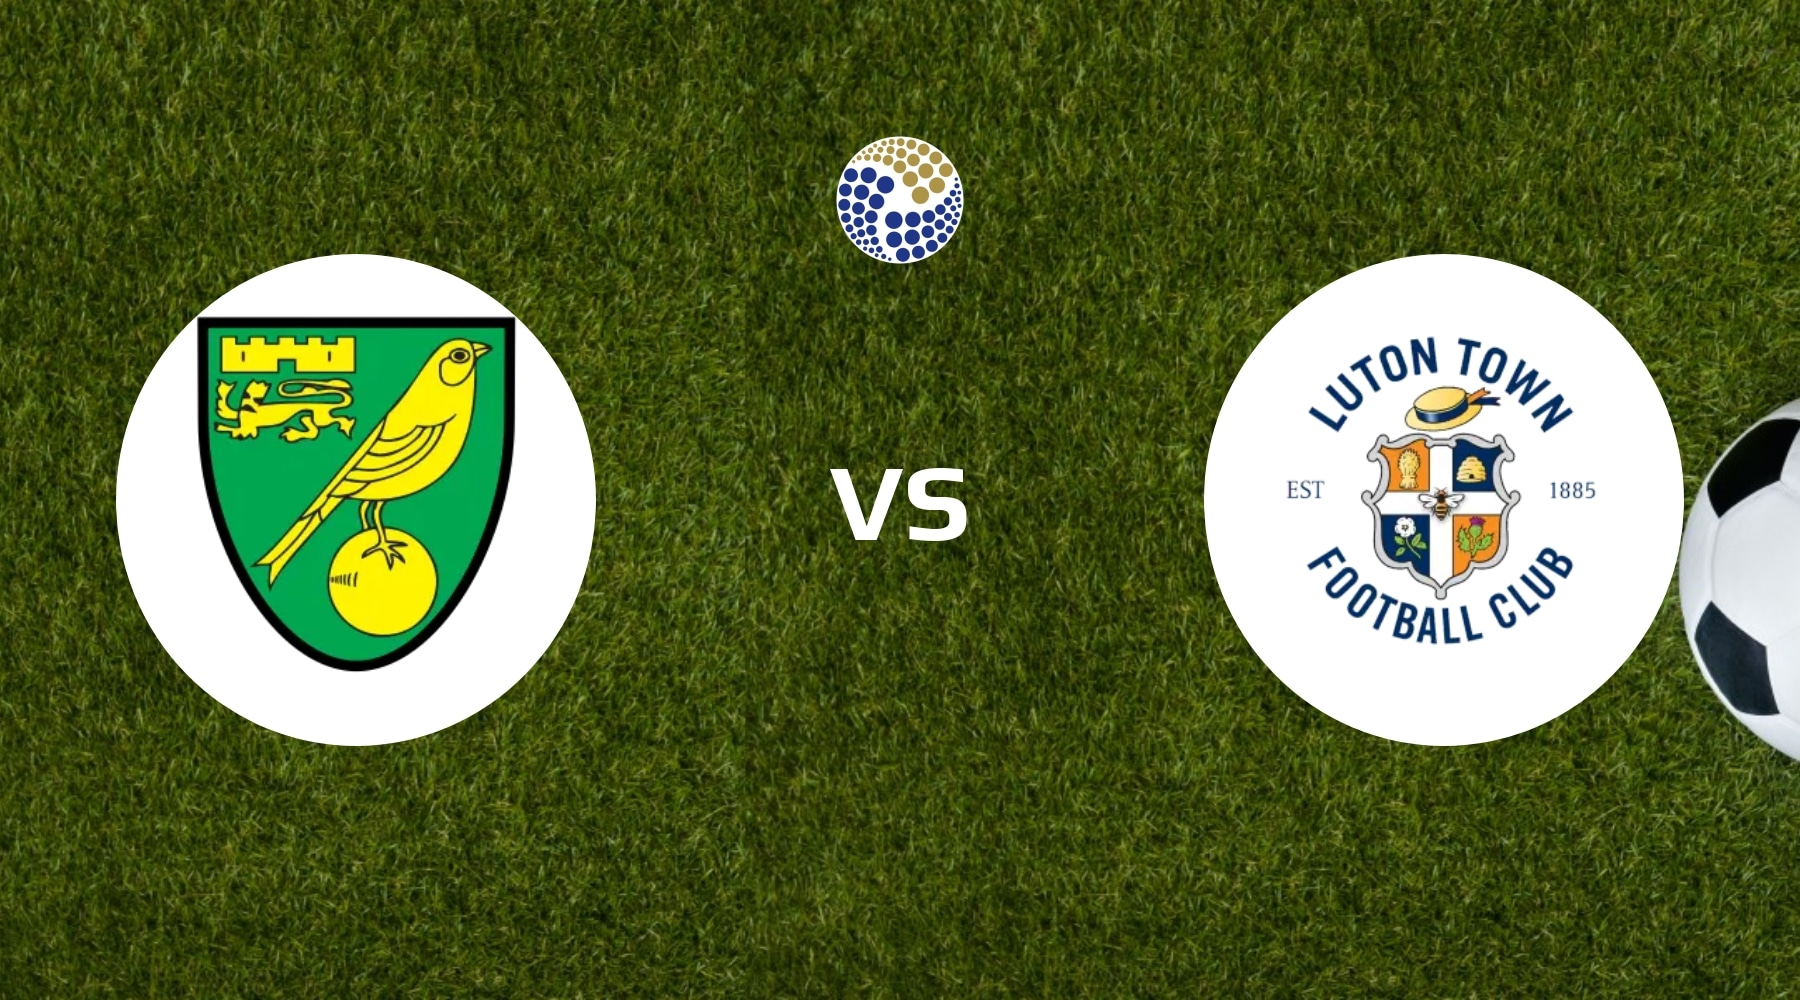 Norwich vs Luton Betting